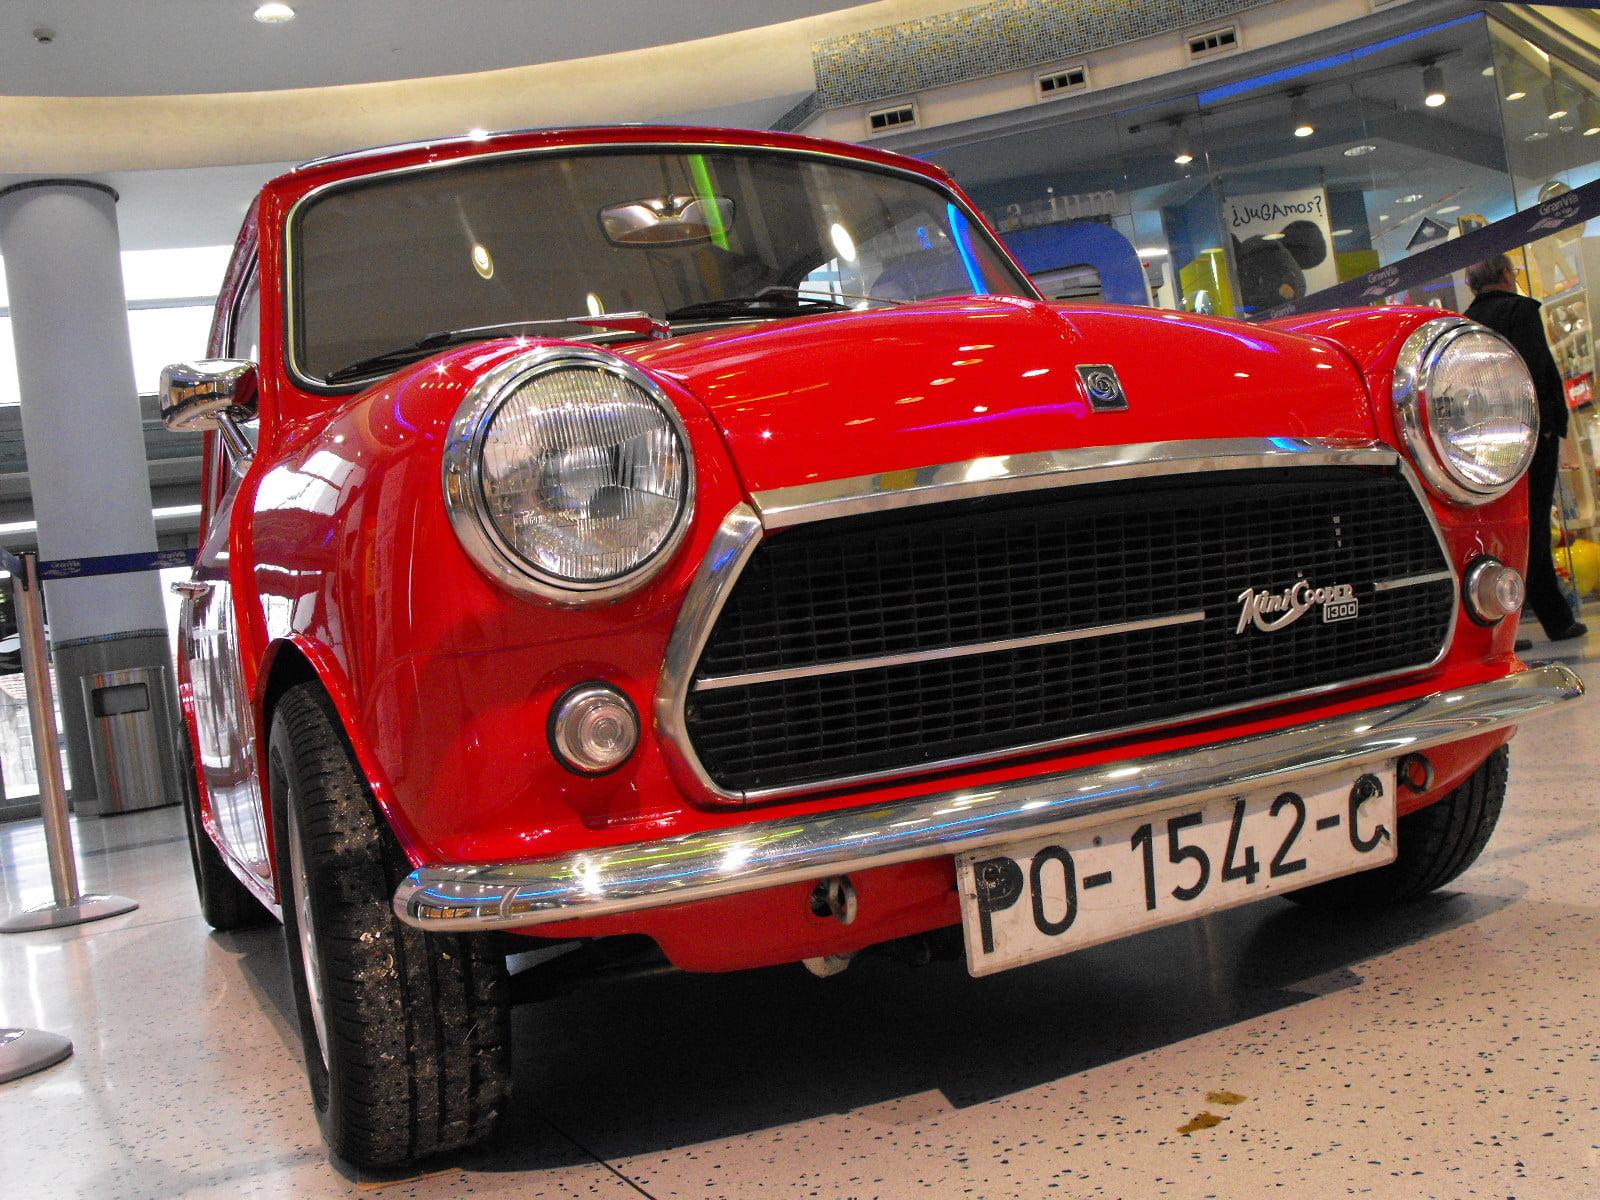 Exposición de Vehículos Clásicos